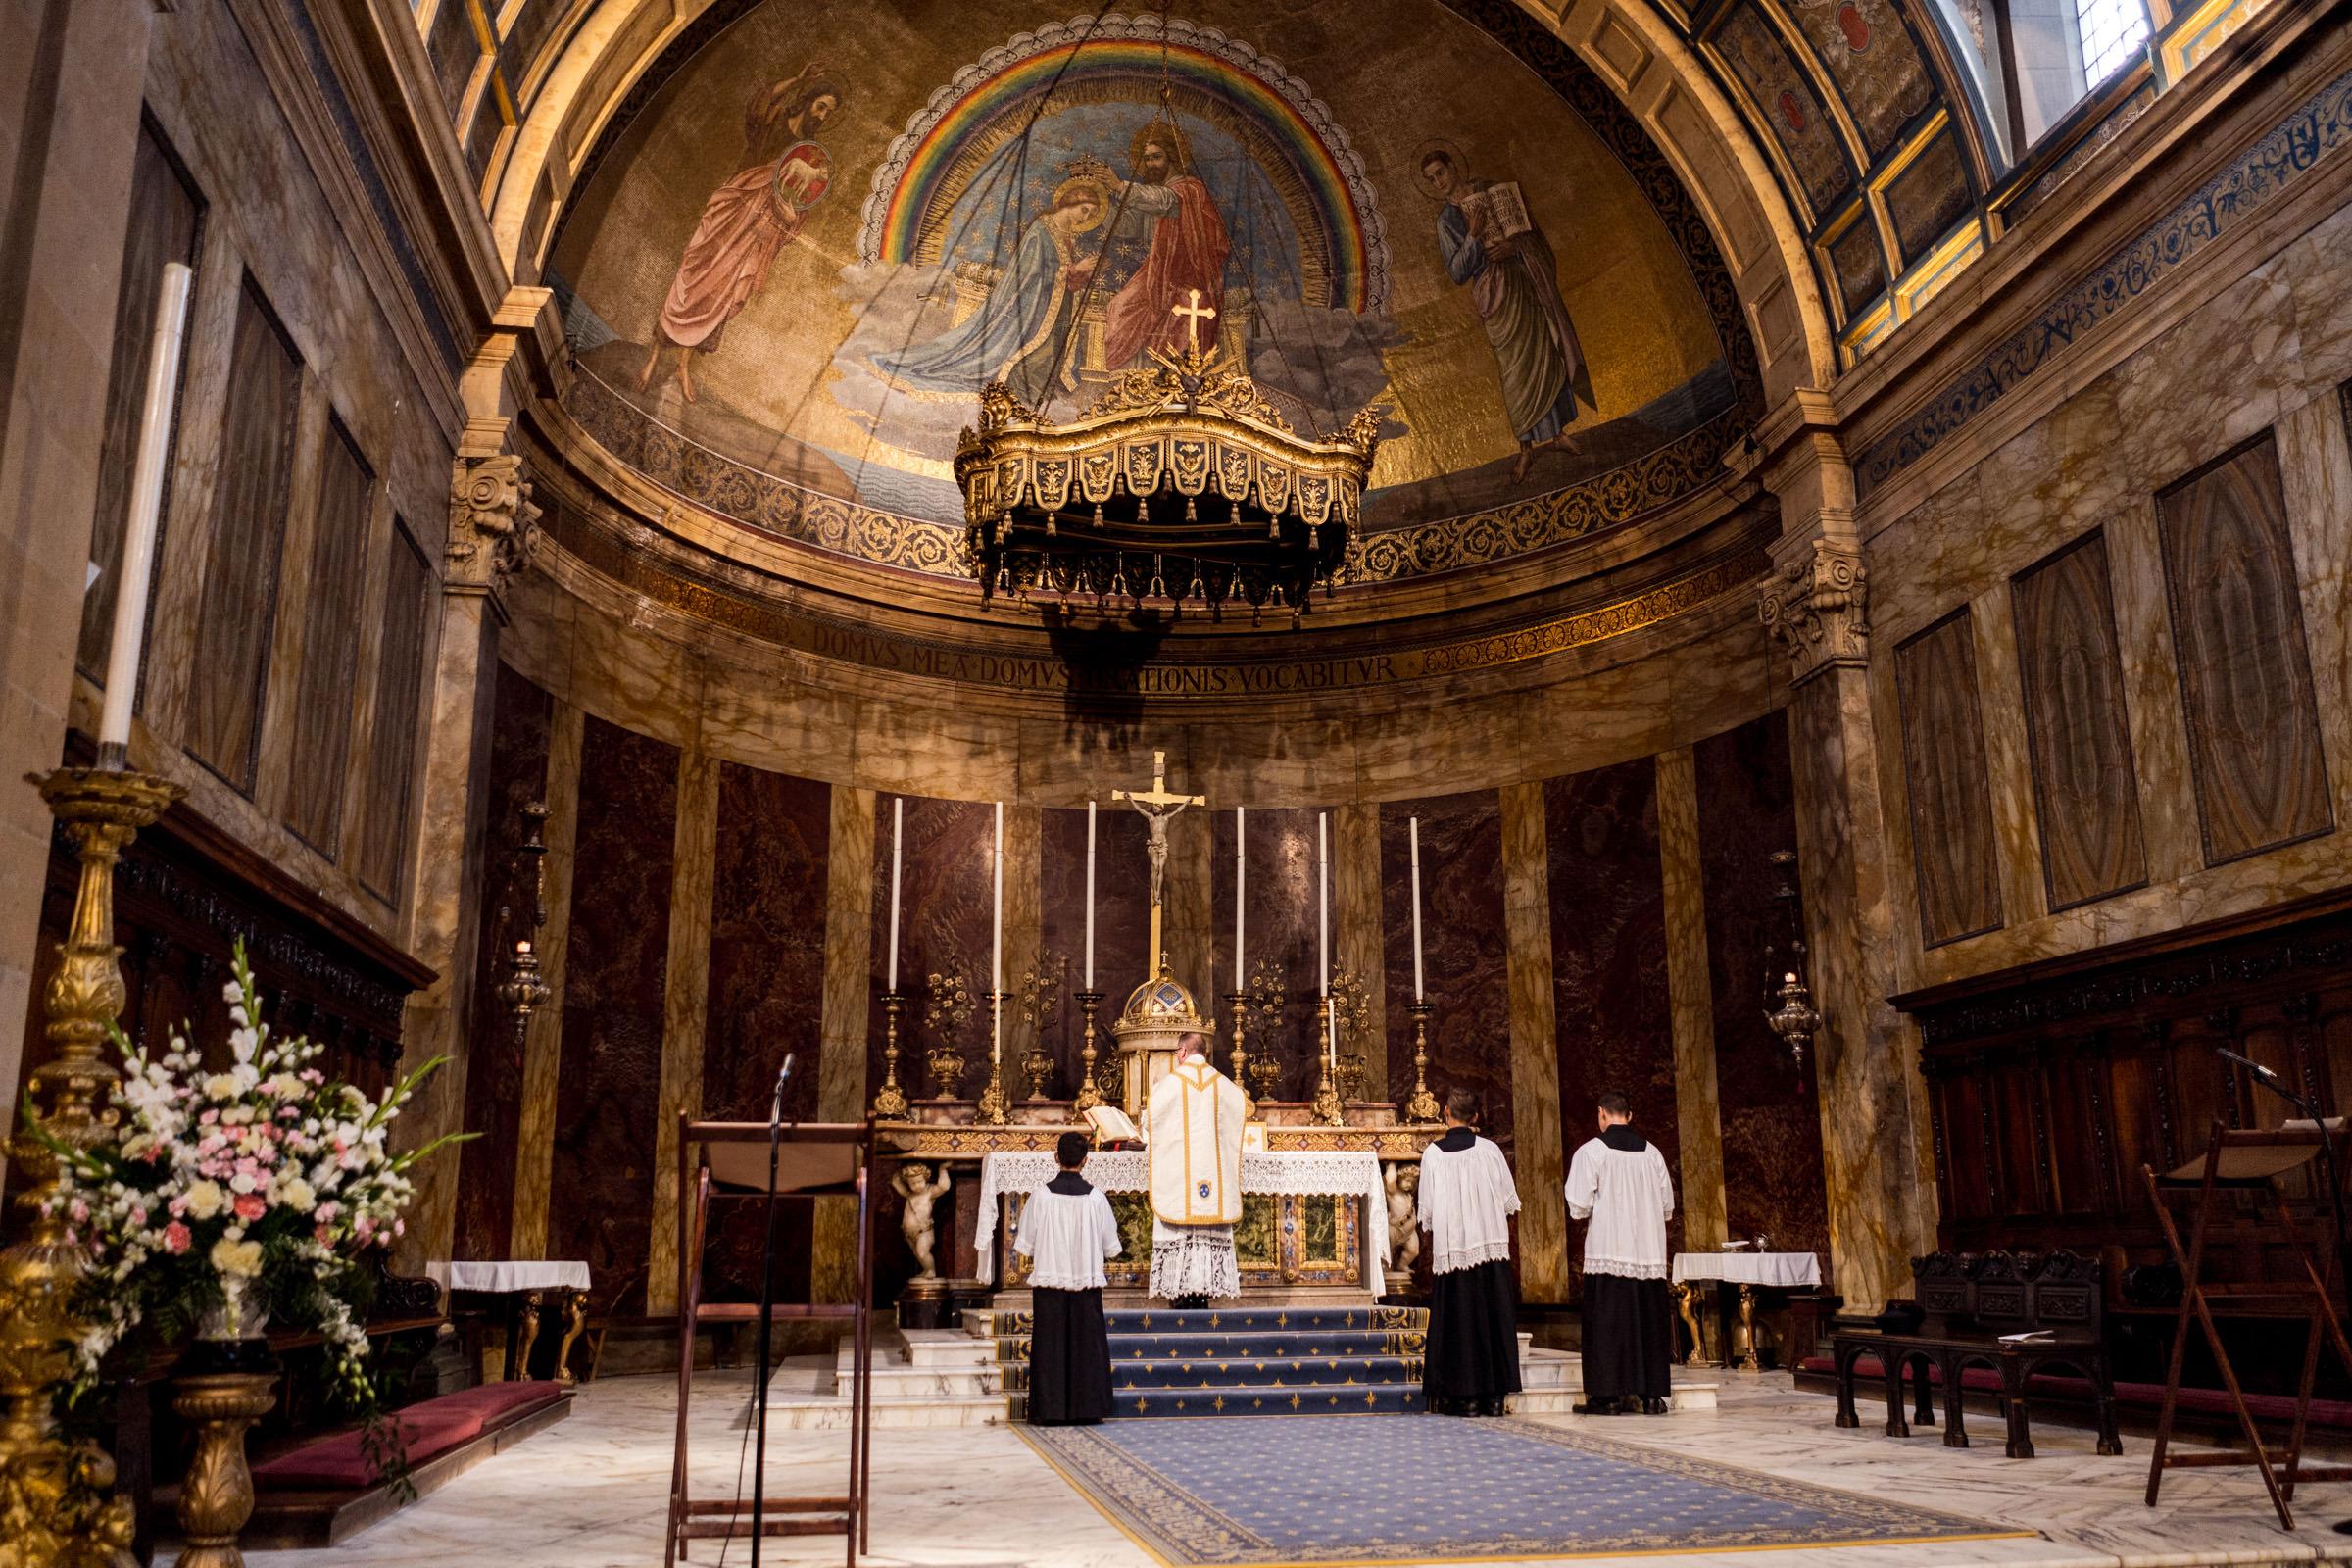 The Oratory of Saint Phillip Neri Birmingham Wedding Photography 010.jpg